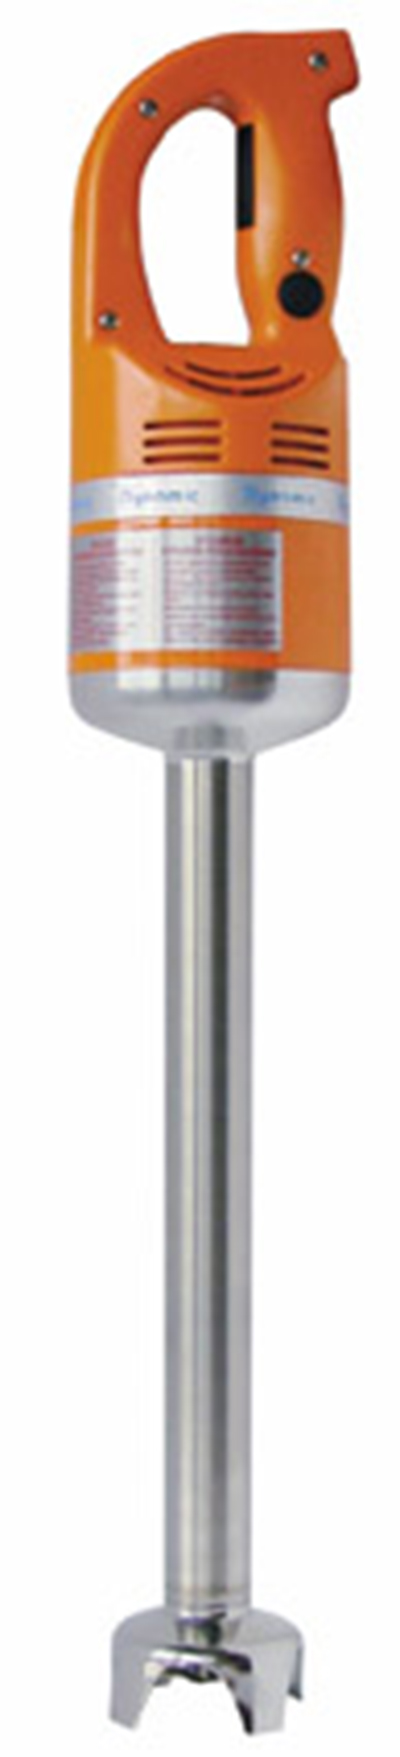 "Dynamic MX013.1-115V 18"" Immersion Master Mixer- 30-gal, 115v"